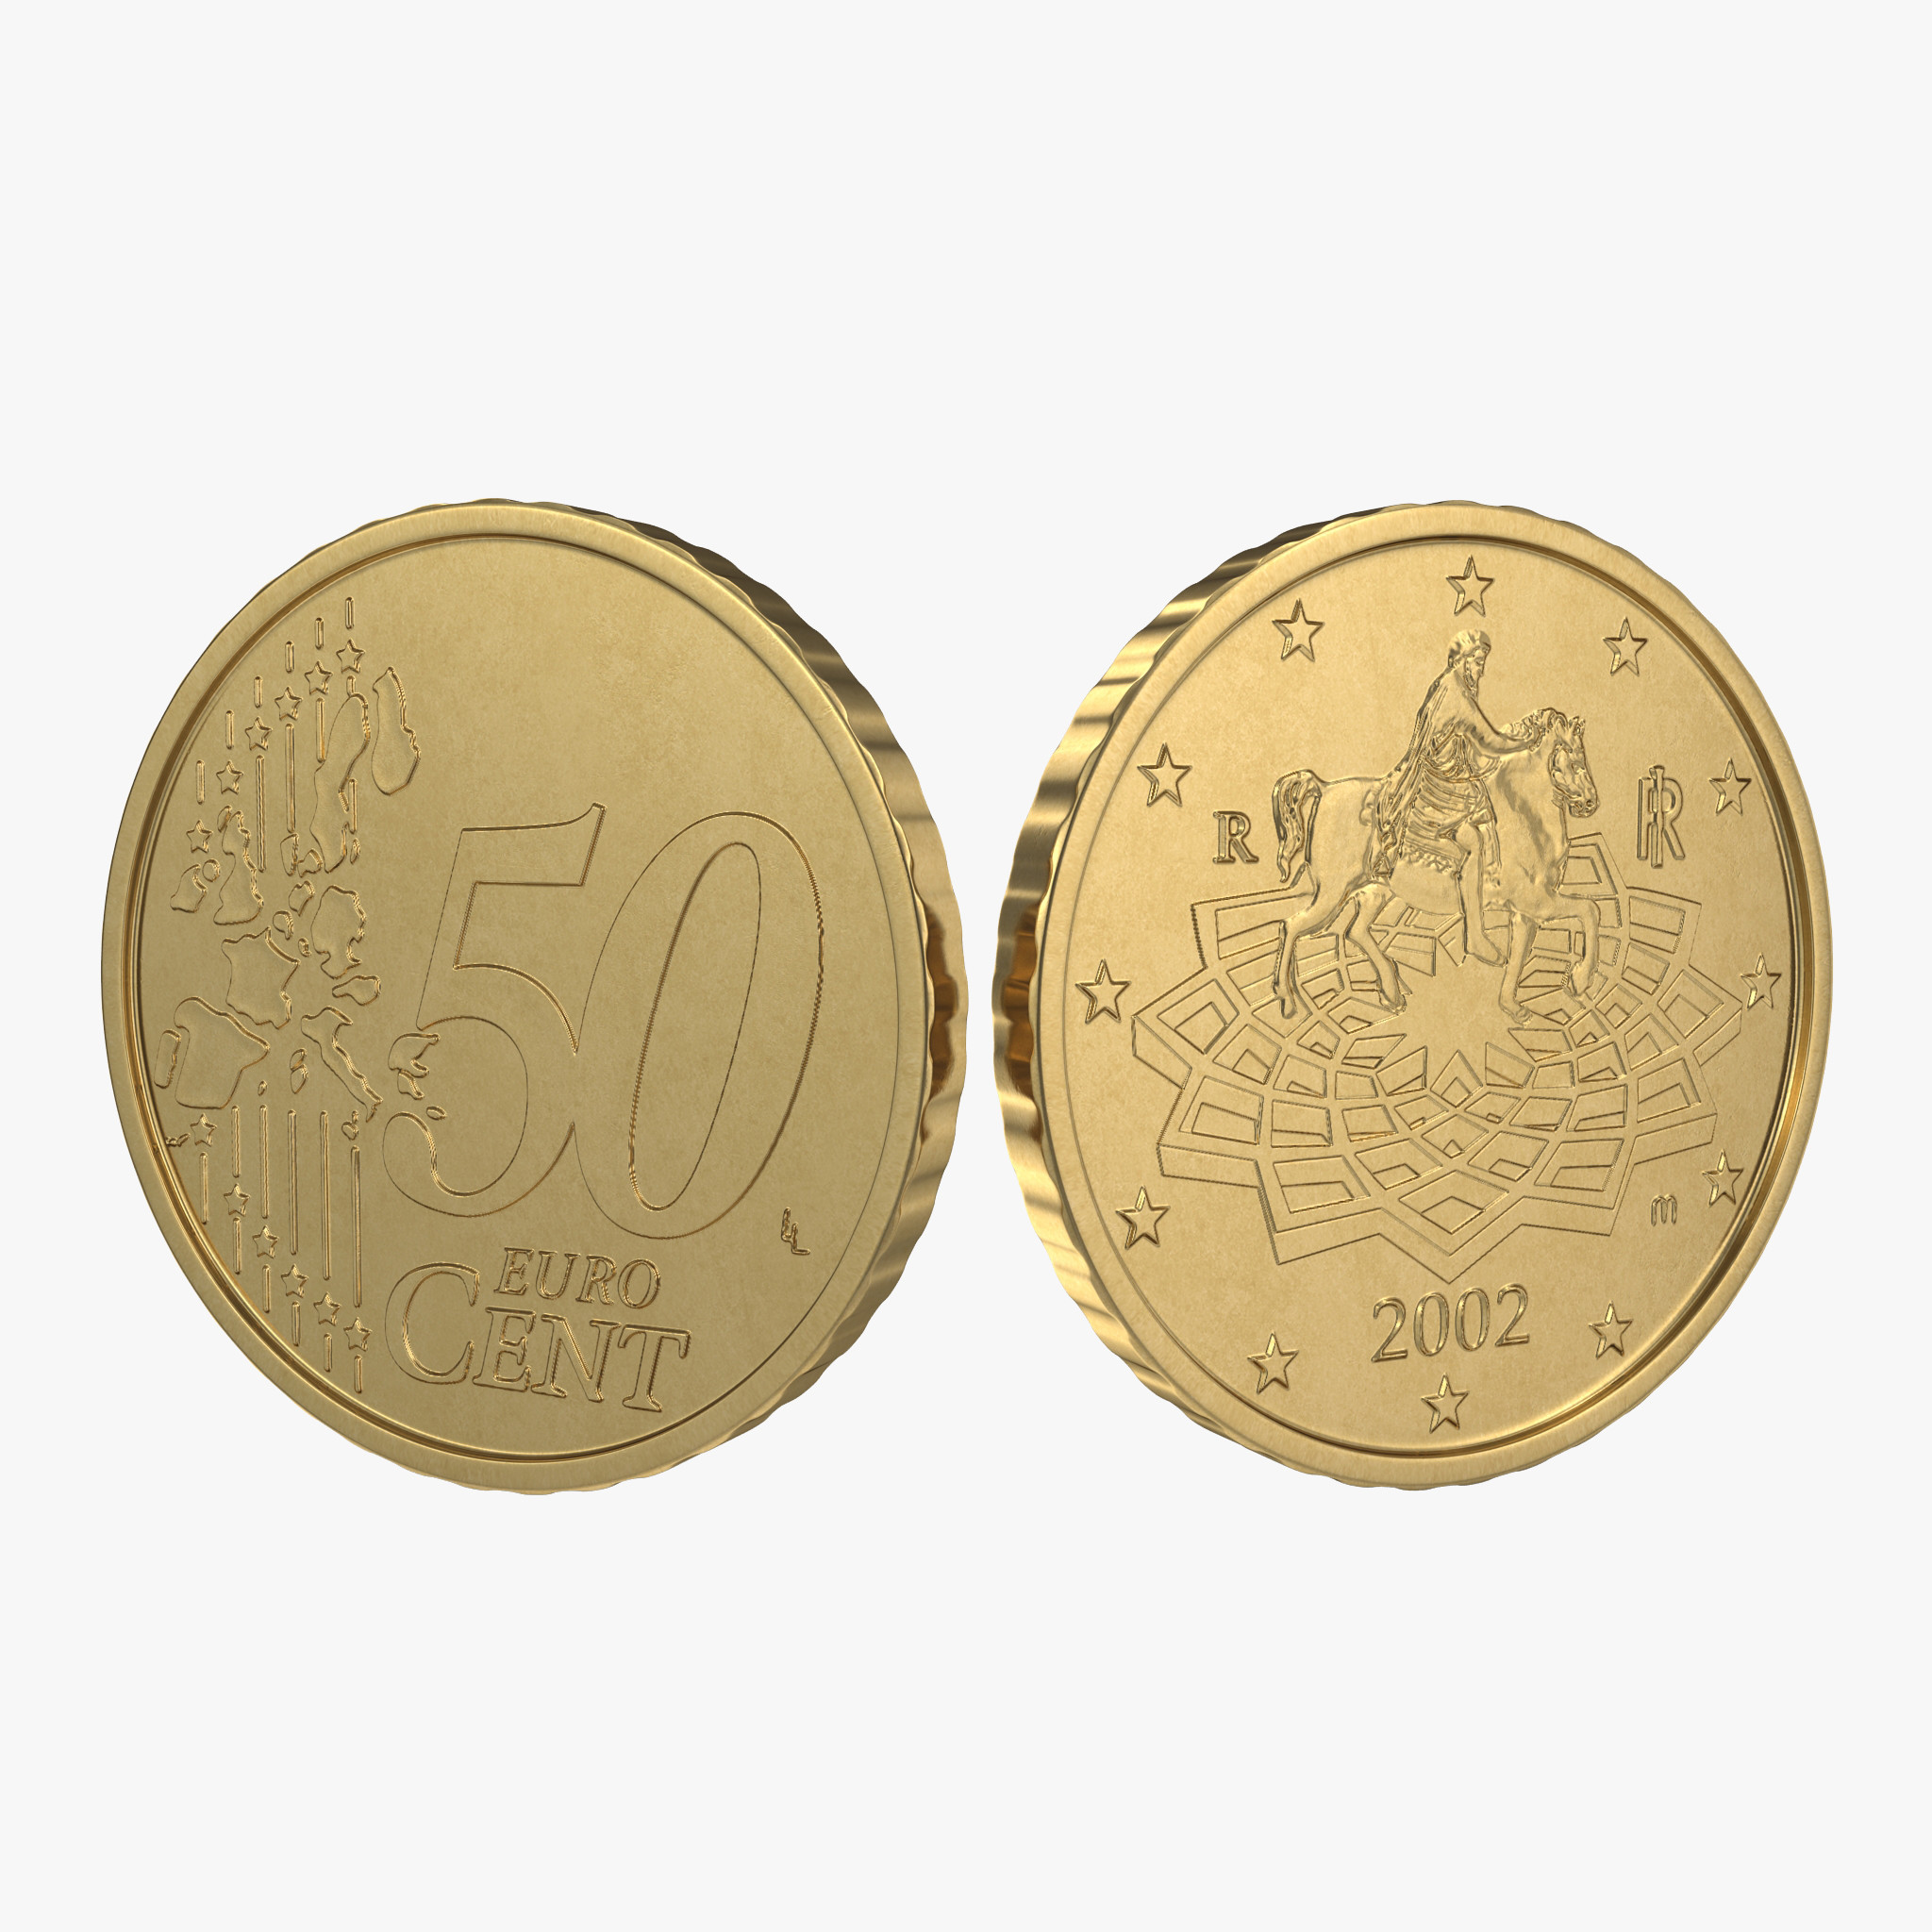 Italian Euro Coin 50 Cent